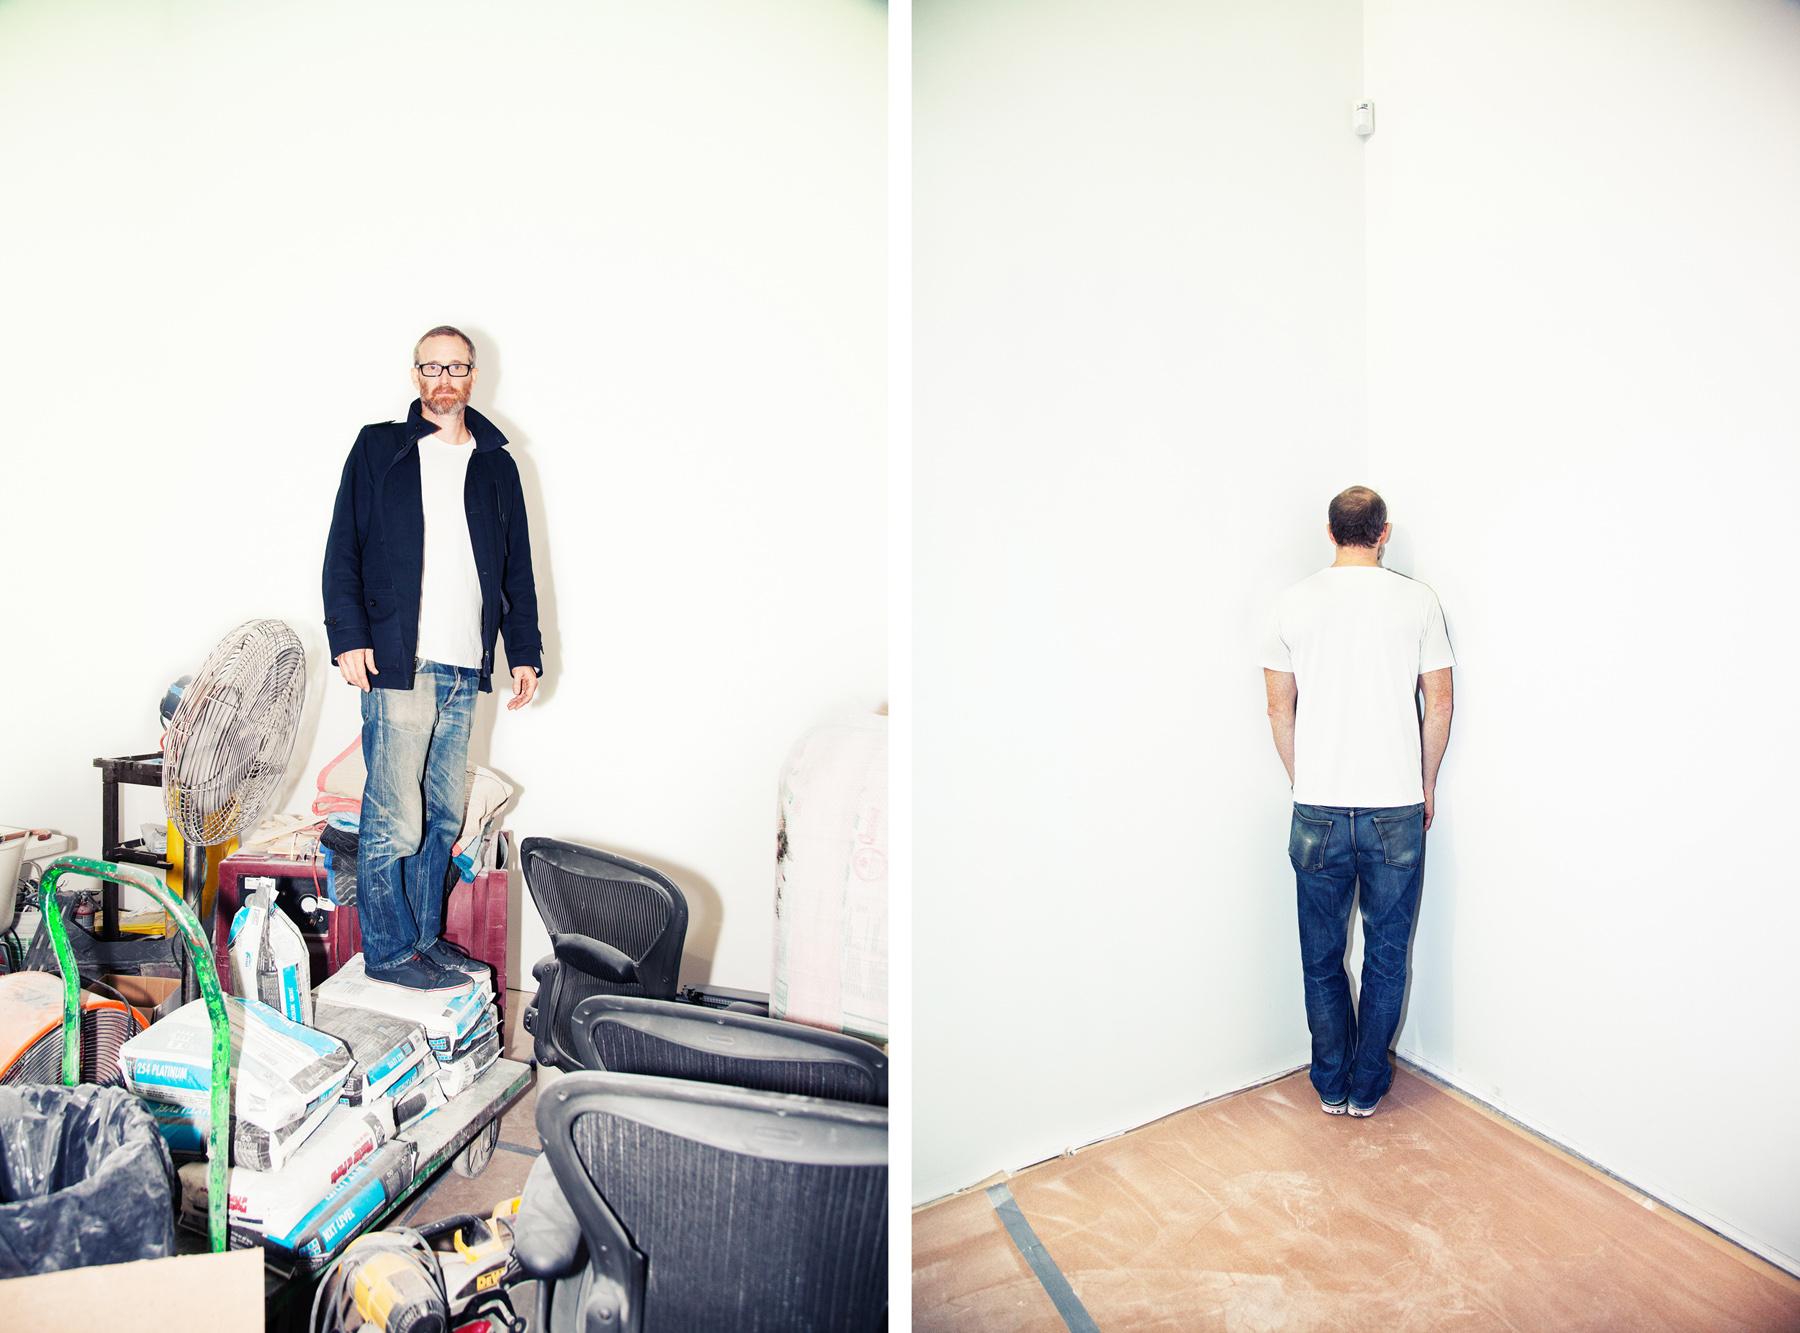 KATE OWEN | MIKE BOUCHET